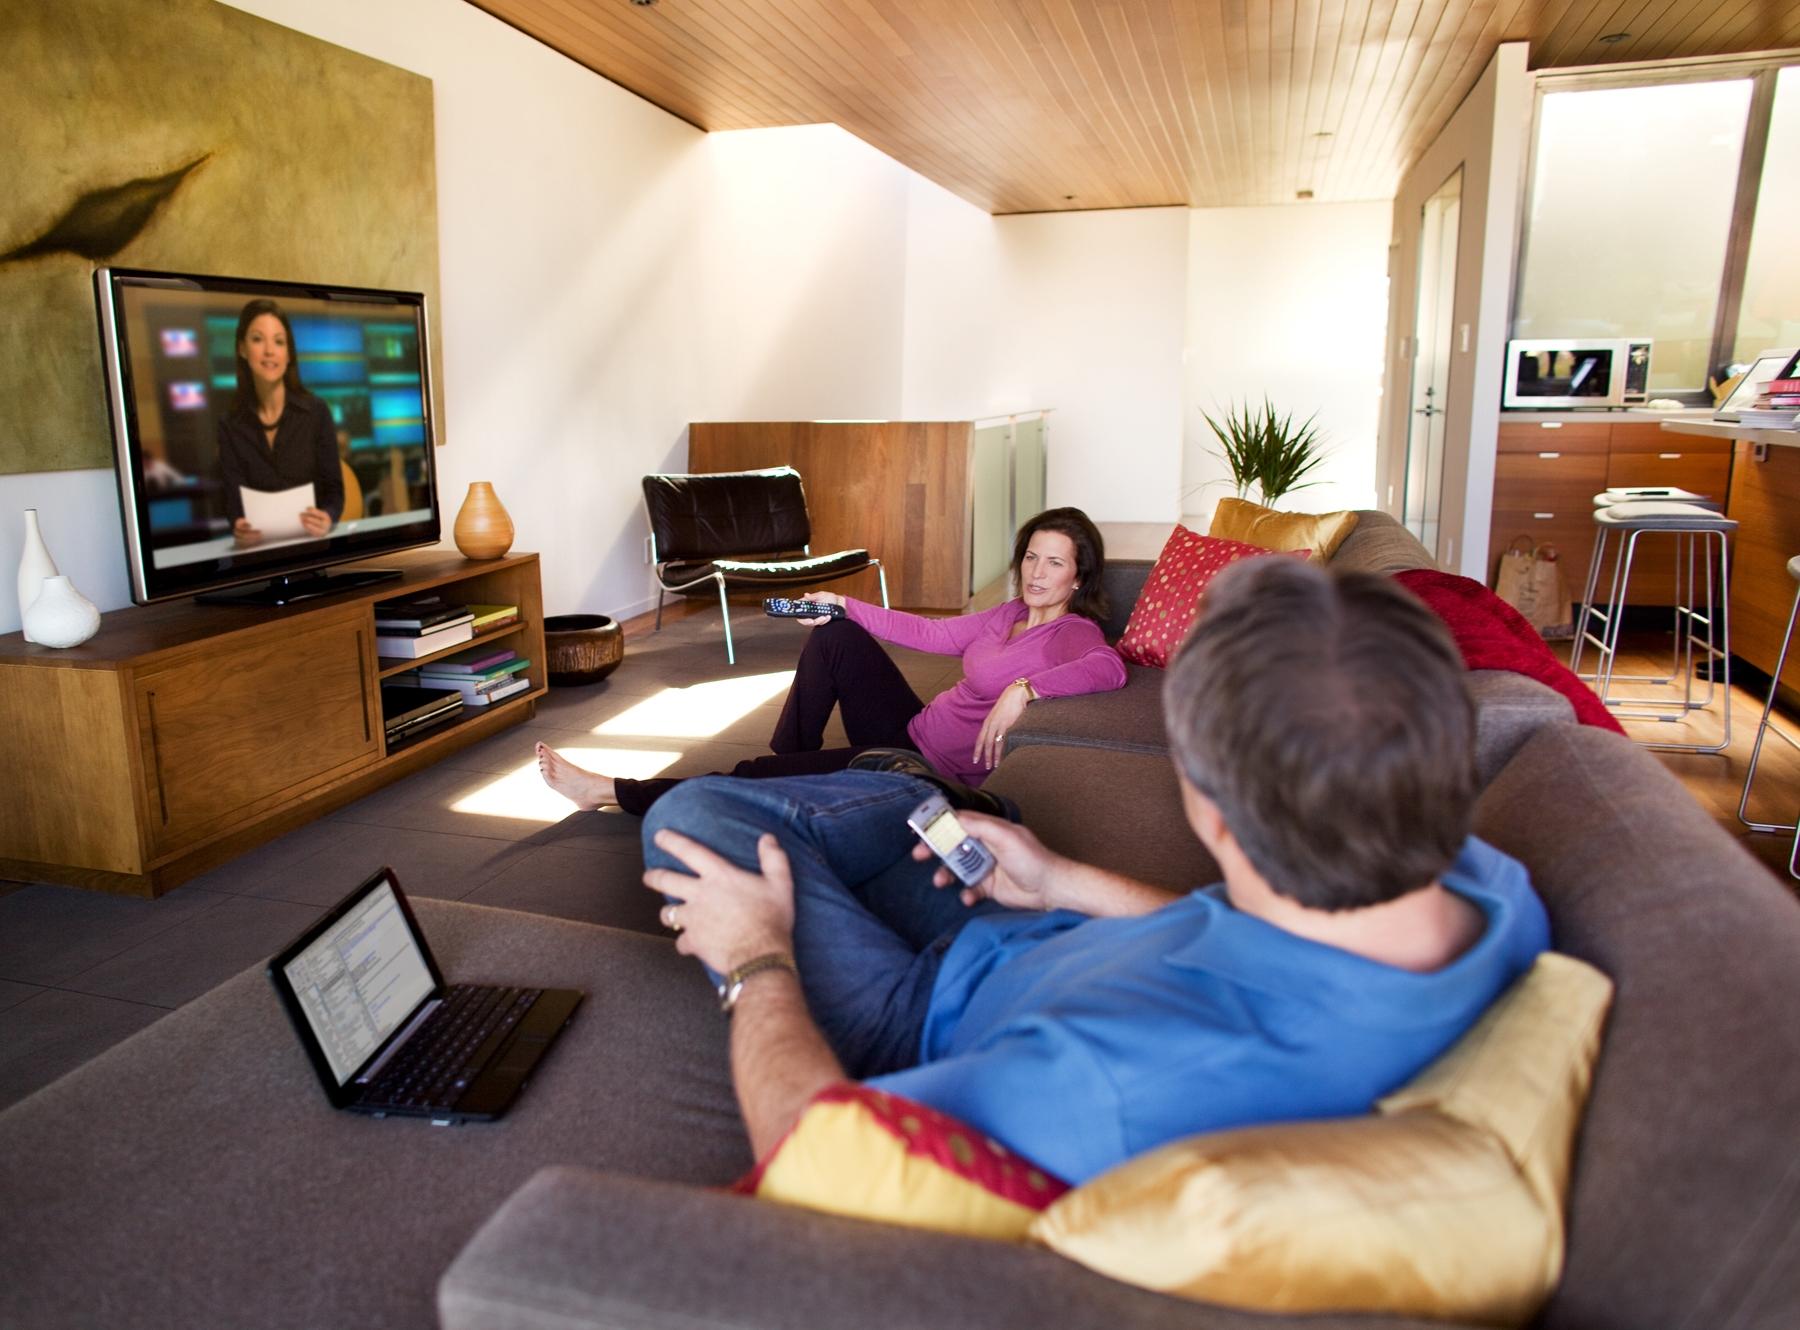 Consumers_Sigital_Multitasking_at_Home.jpg